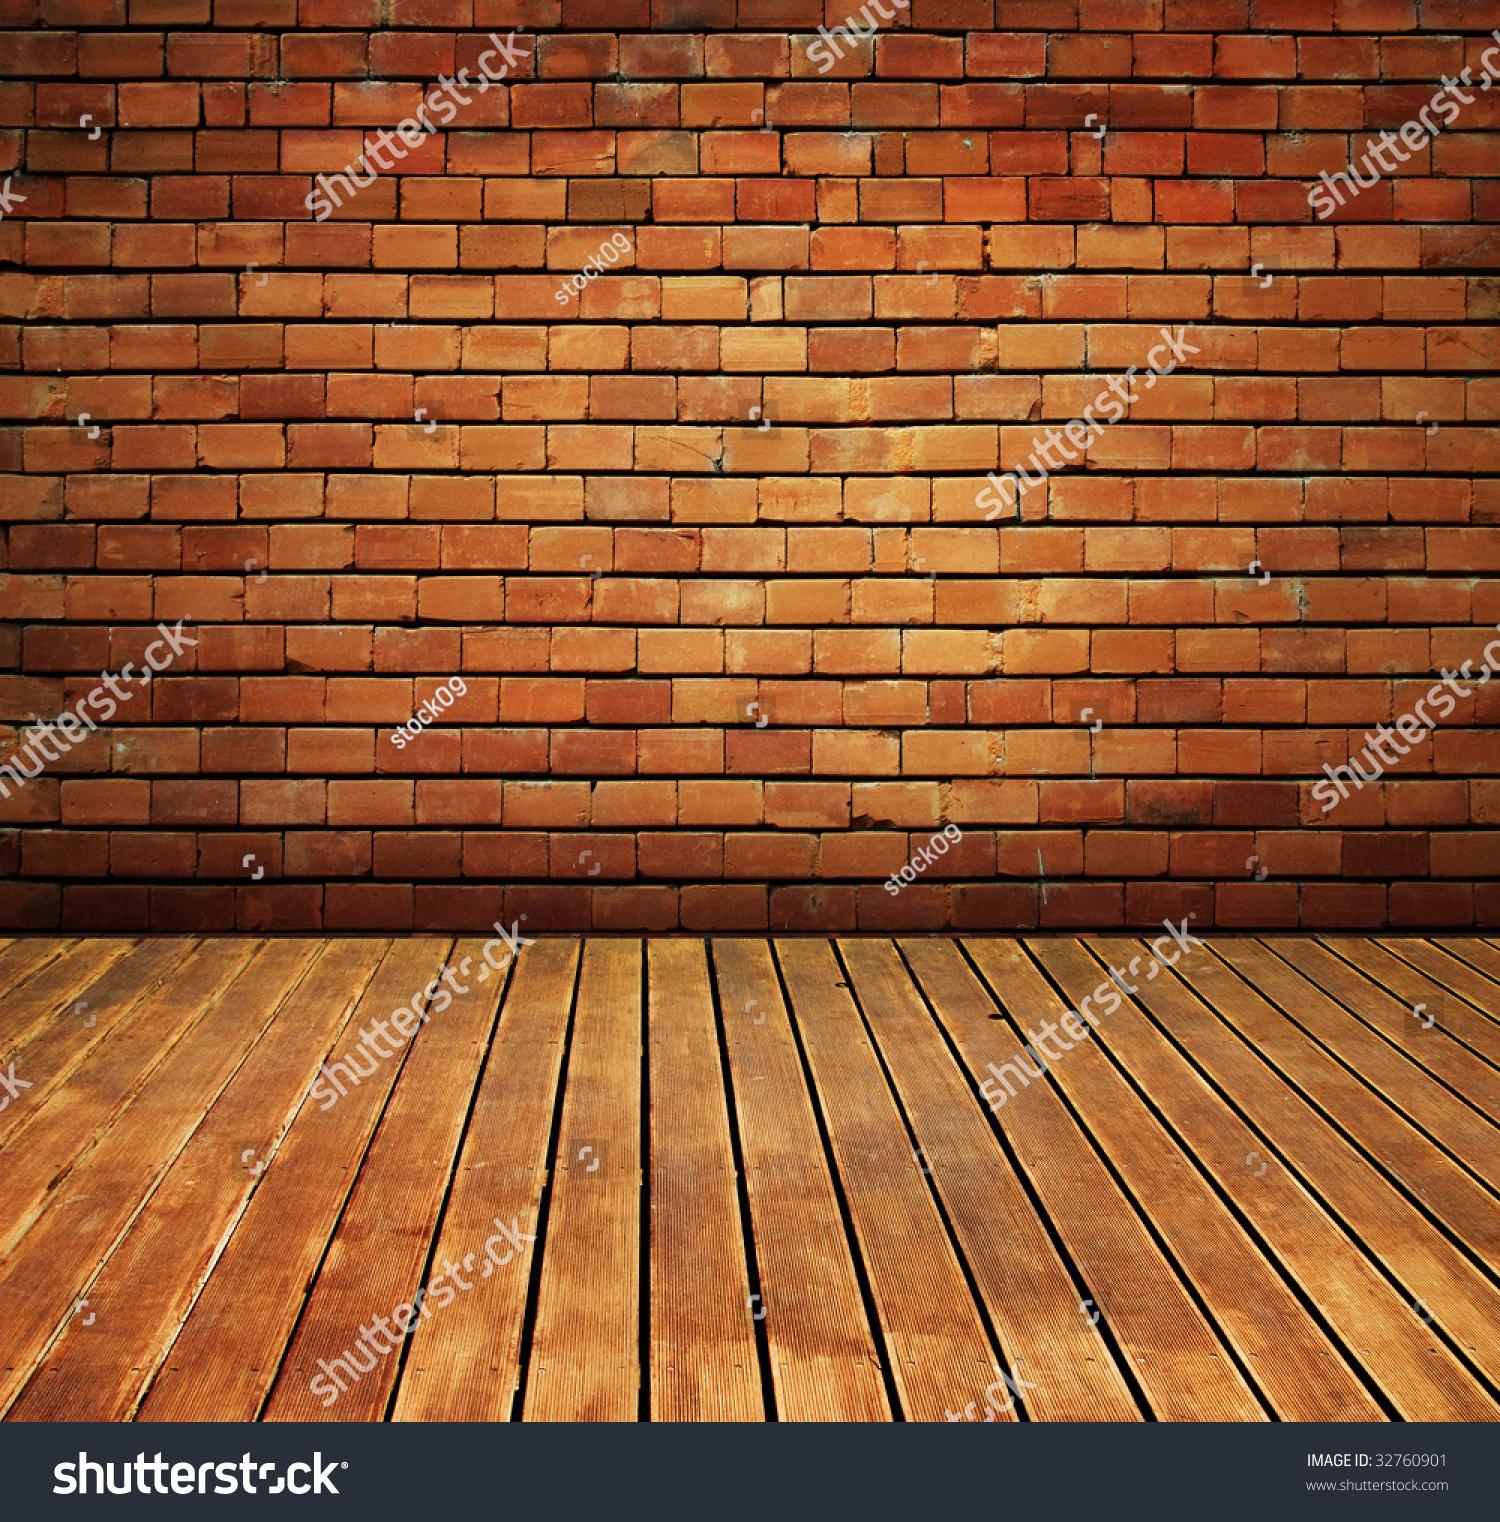 Vintage Brick Wall Wood Floor Texture Stock Photo 32760901 ...